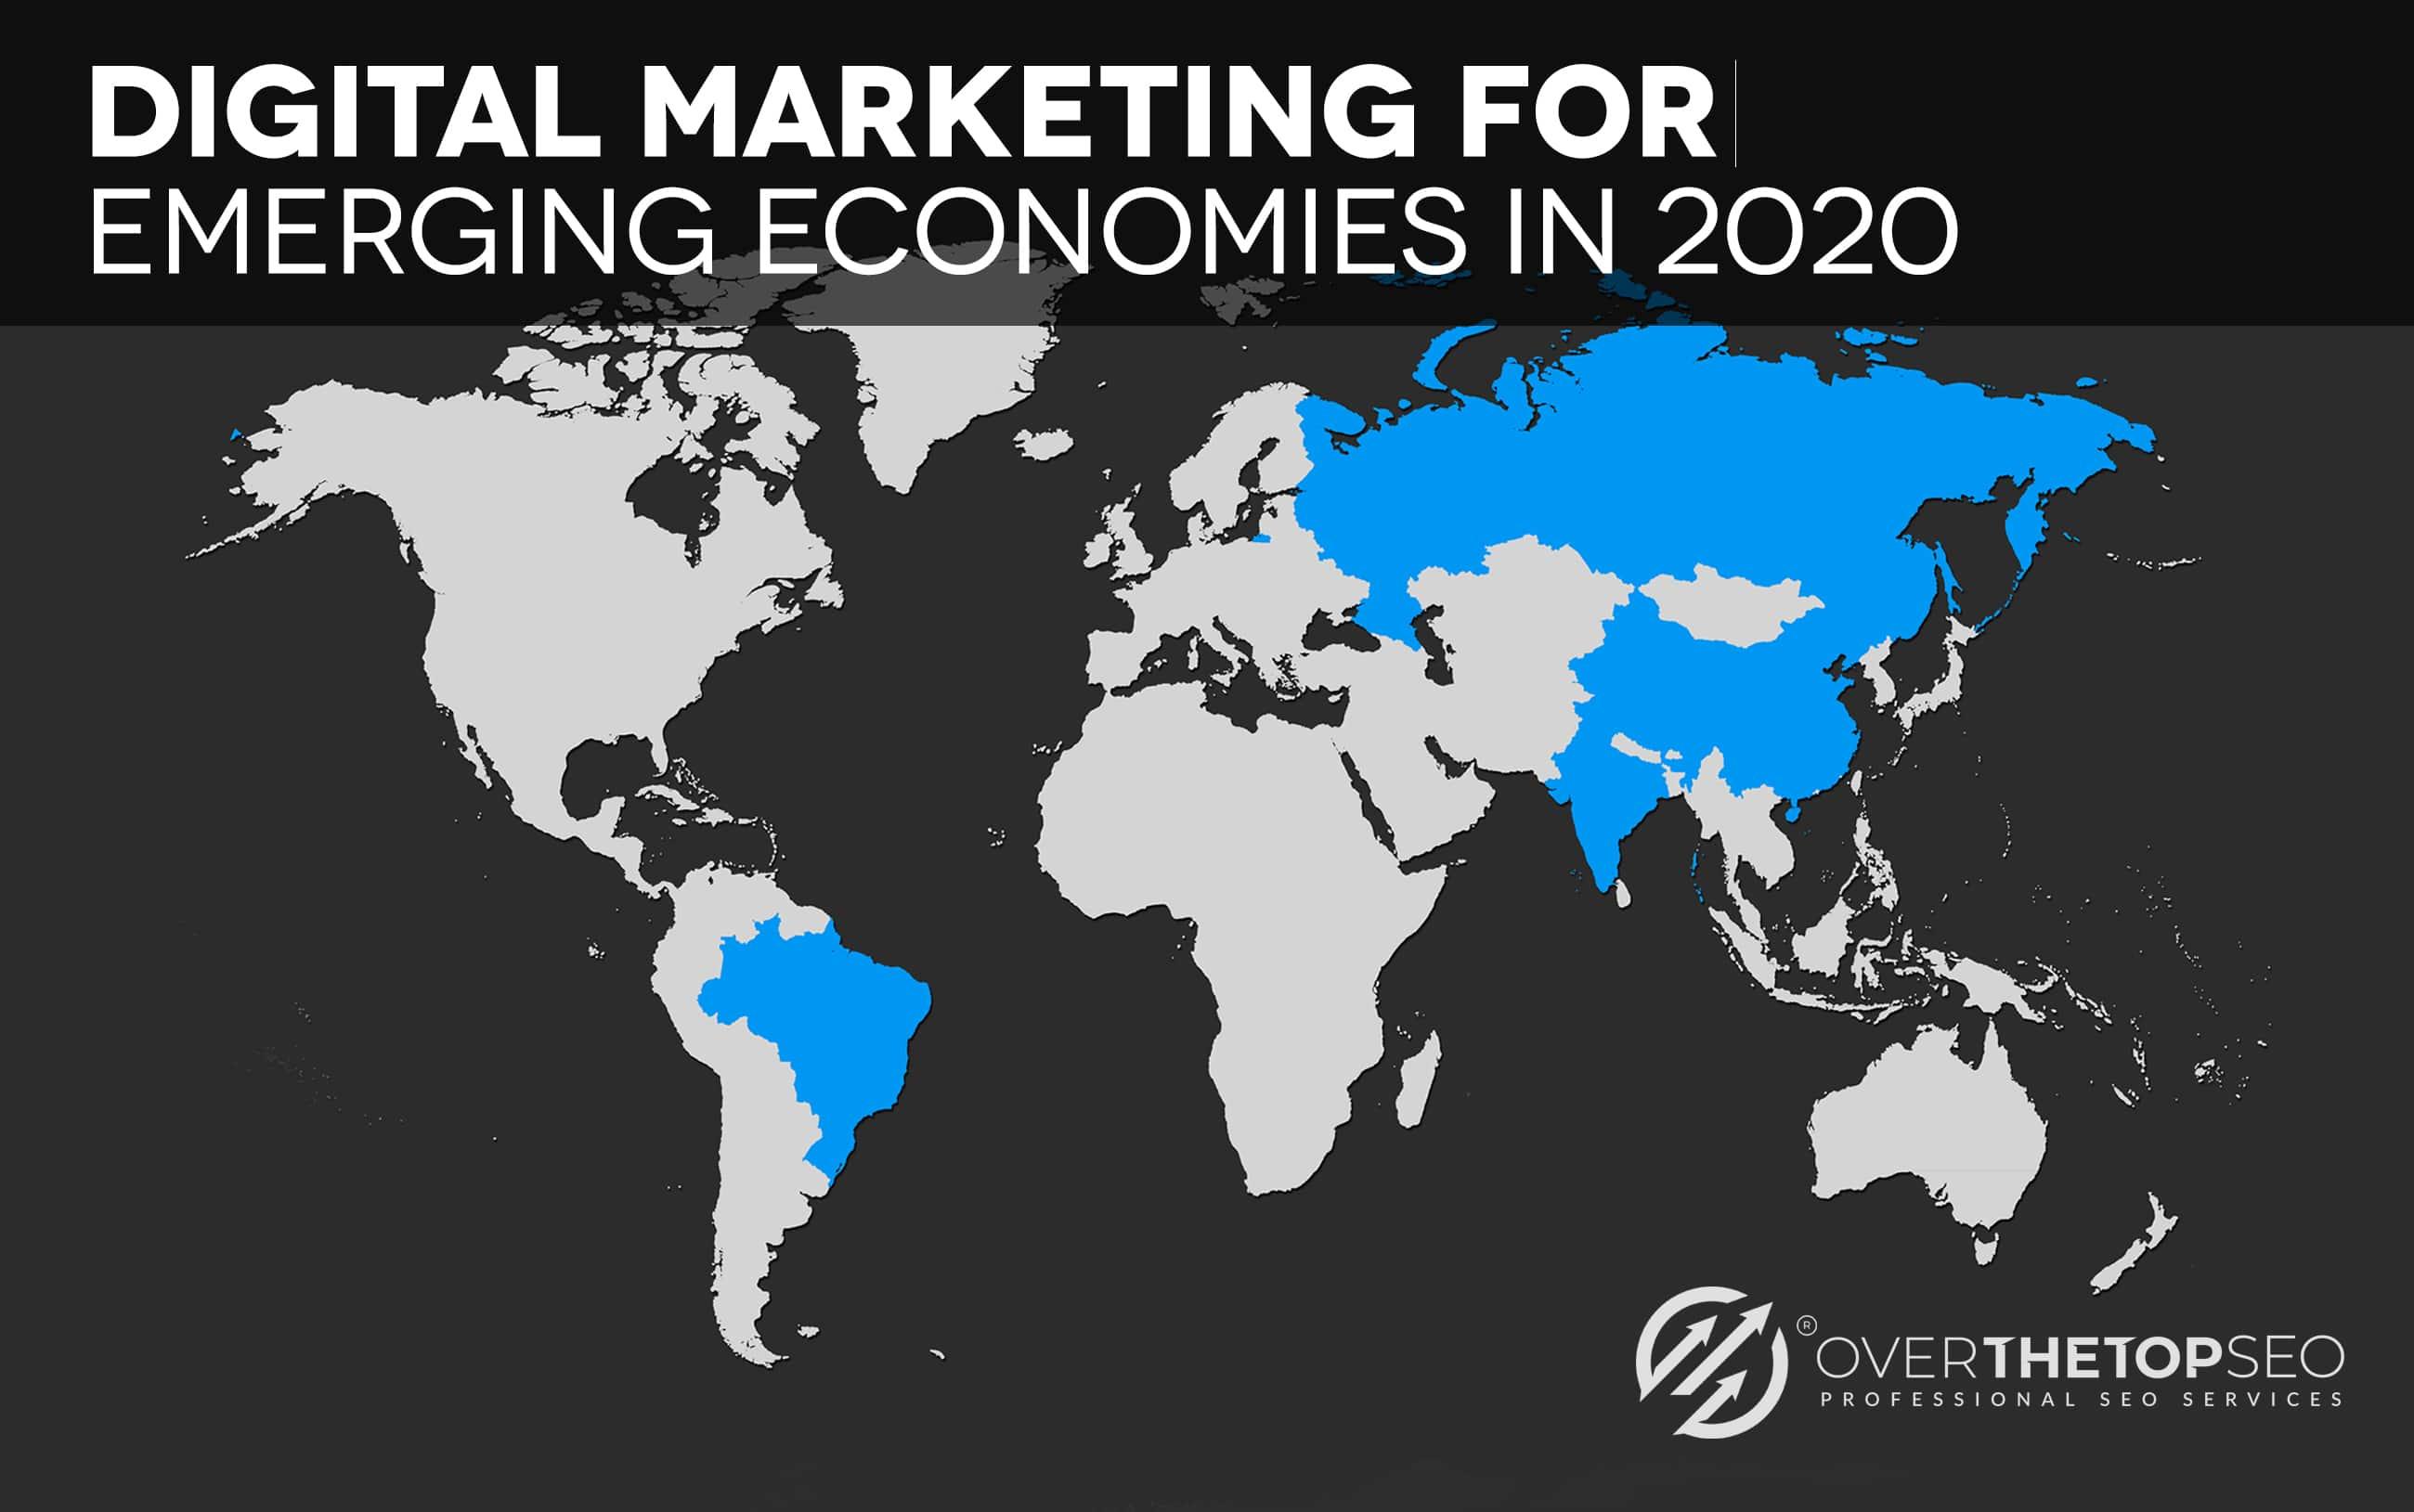 Digital Marketing for Emerging Economies in 2020